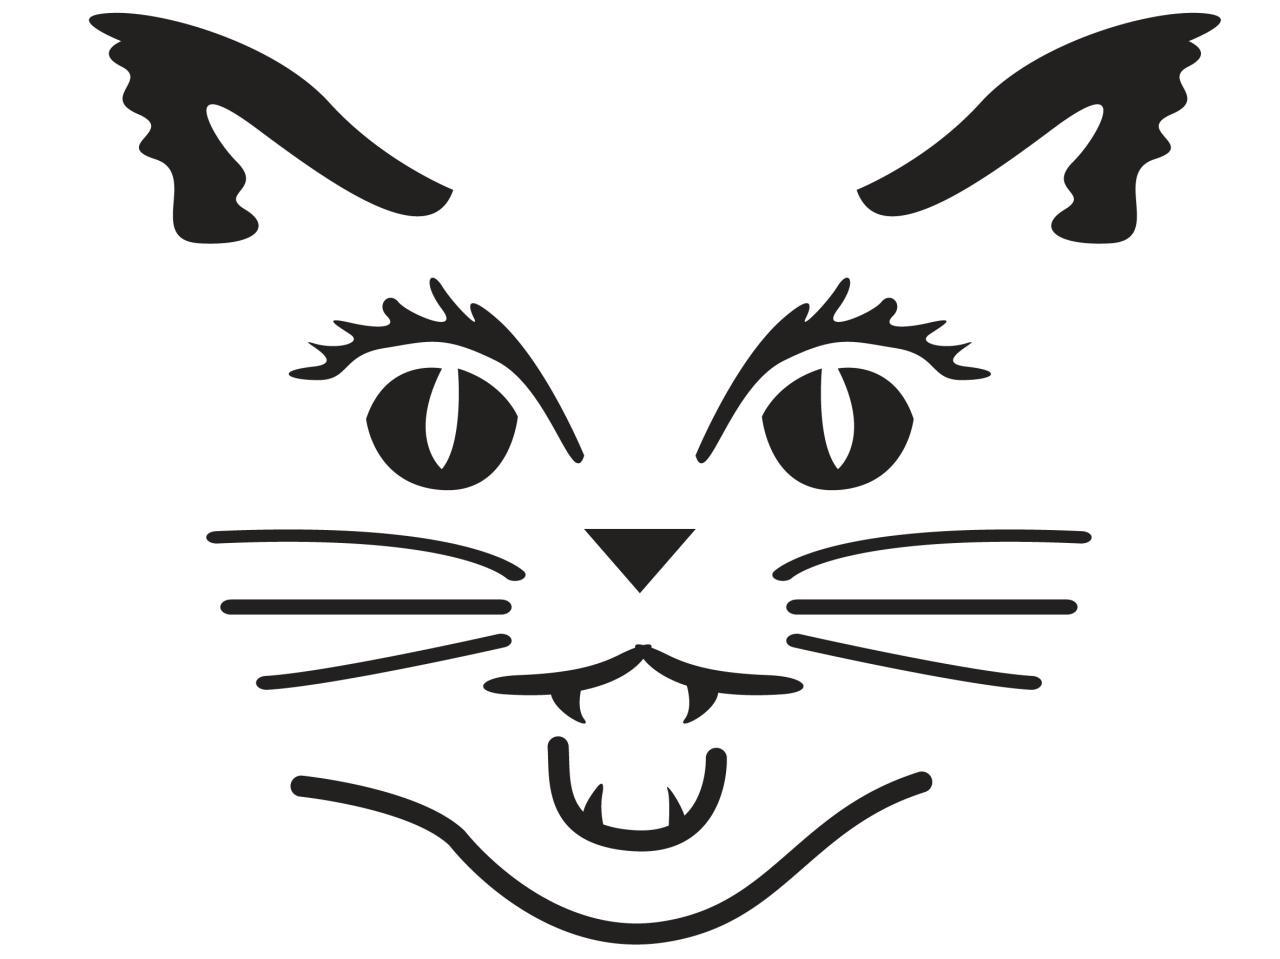 Cat face pumpkin carving pattern stencil template designs | Happy ...